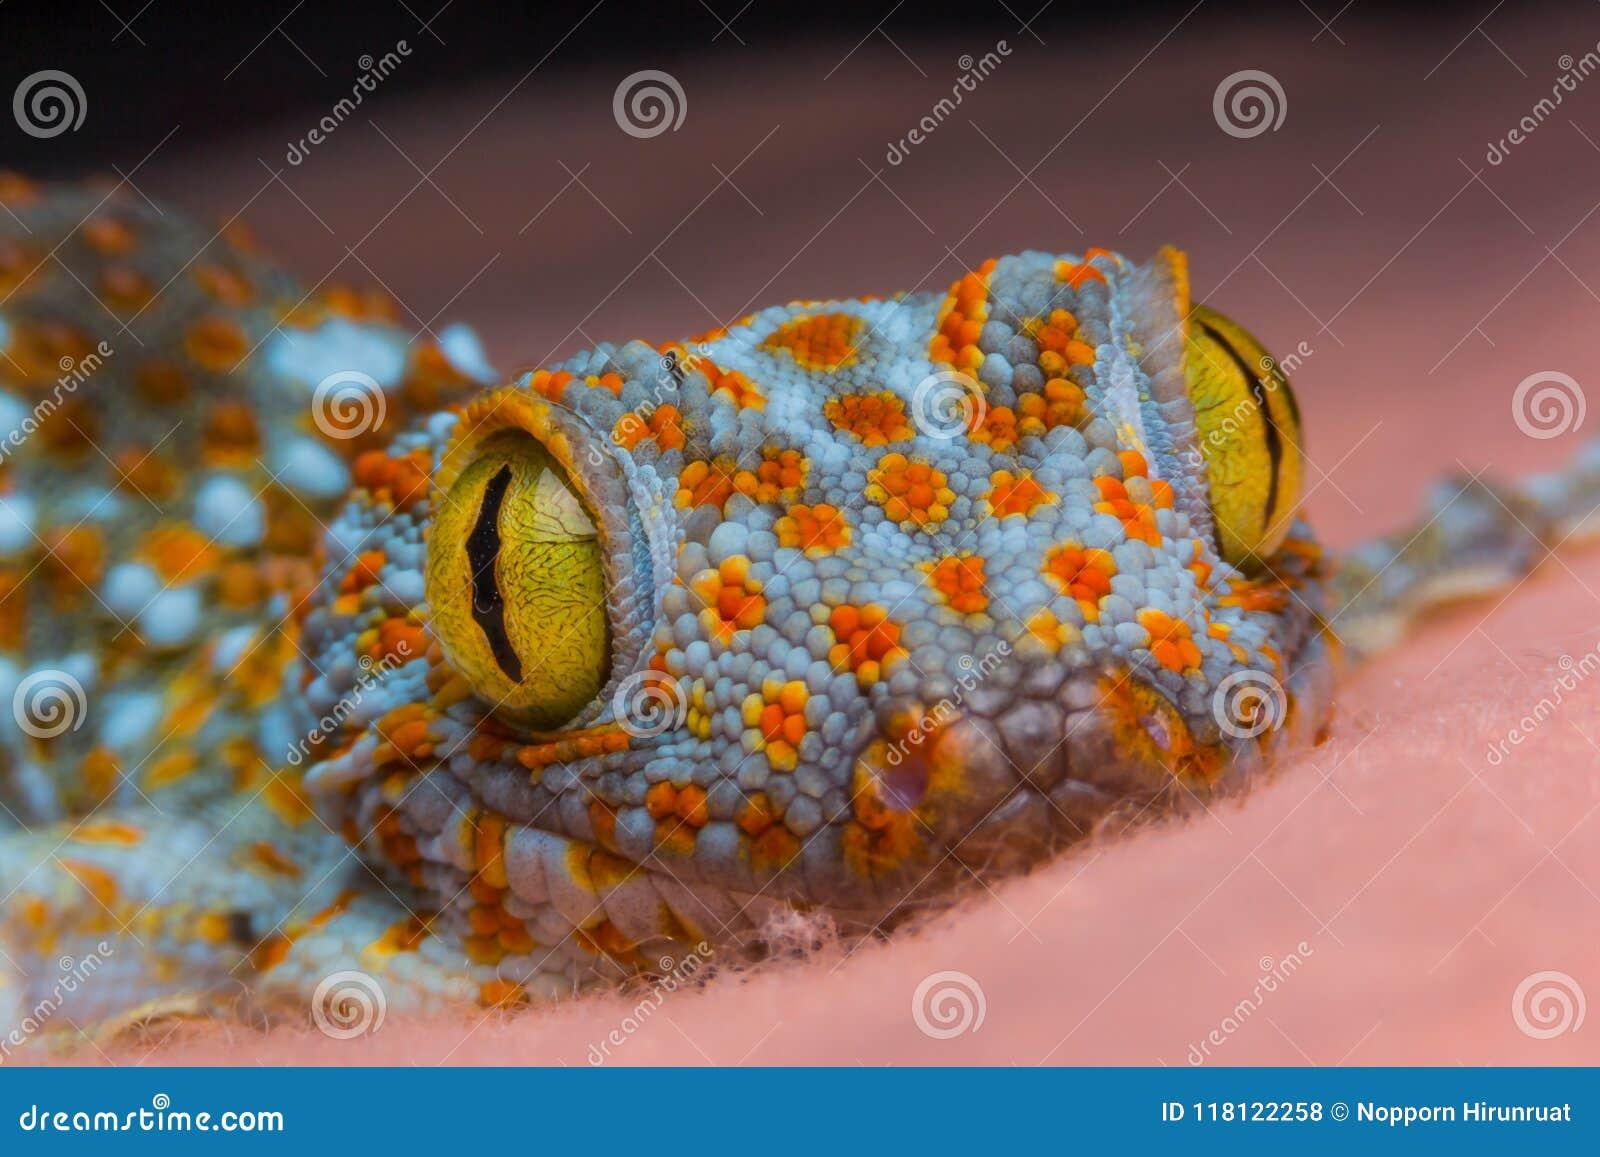 Oeil de gecko